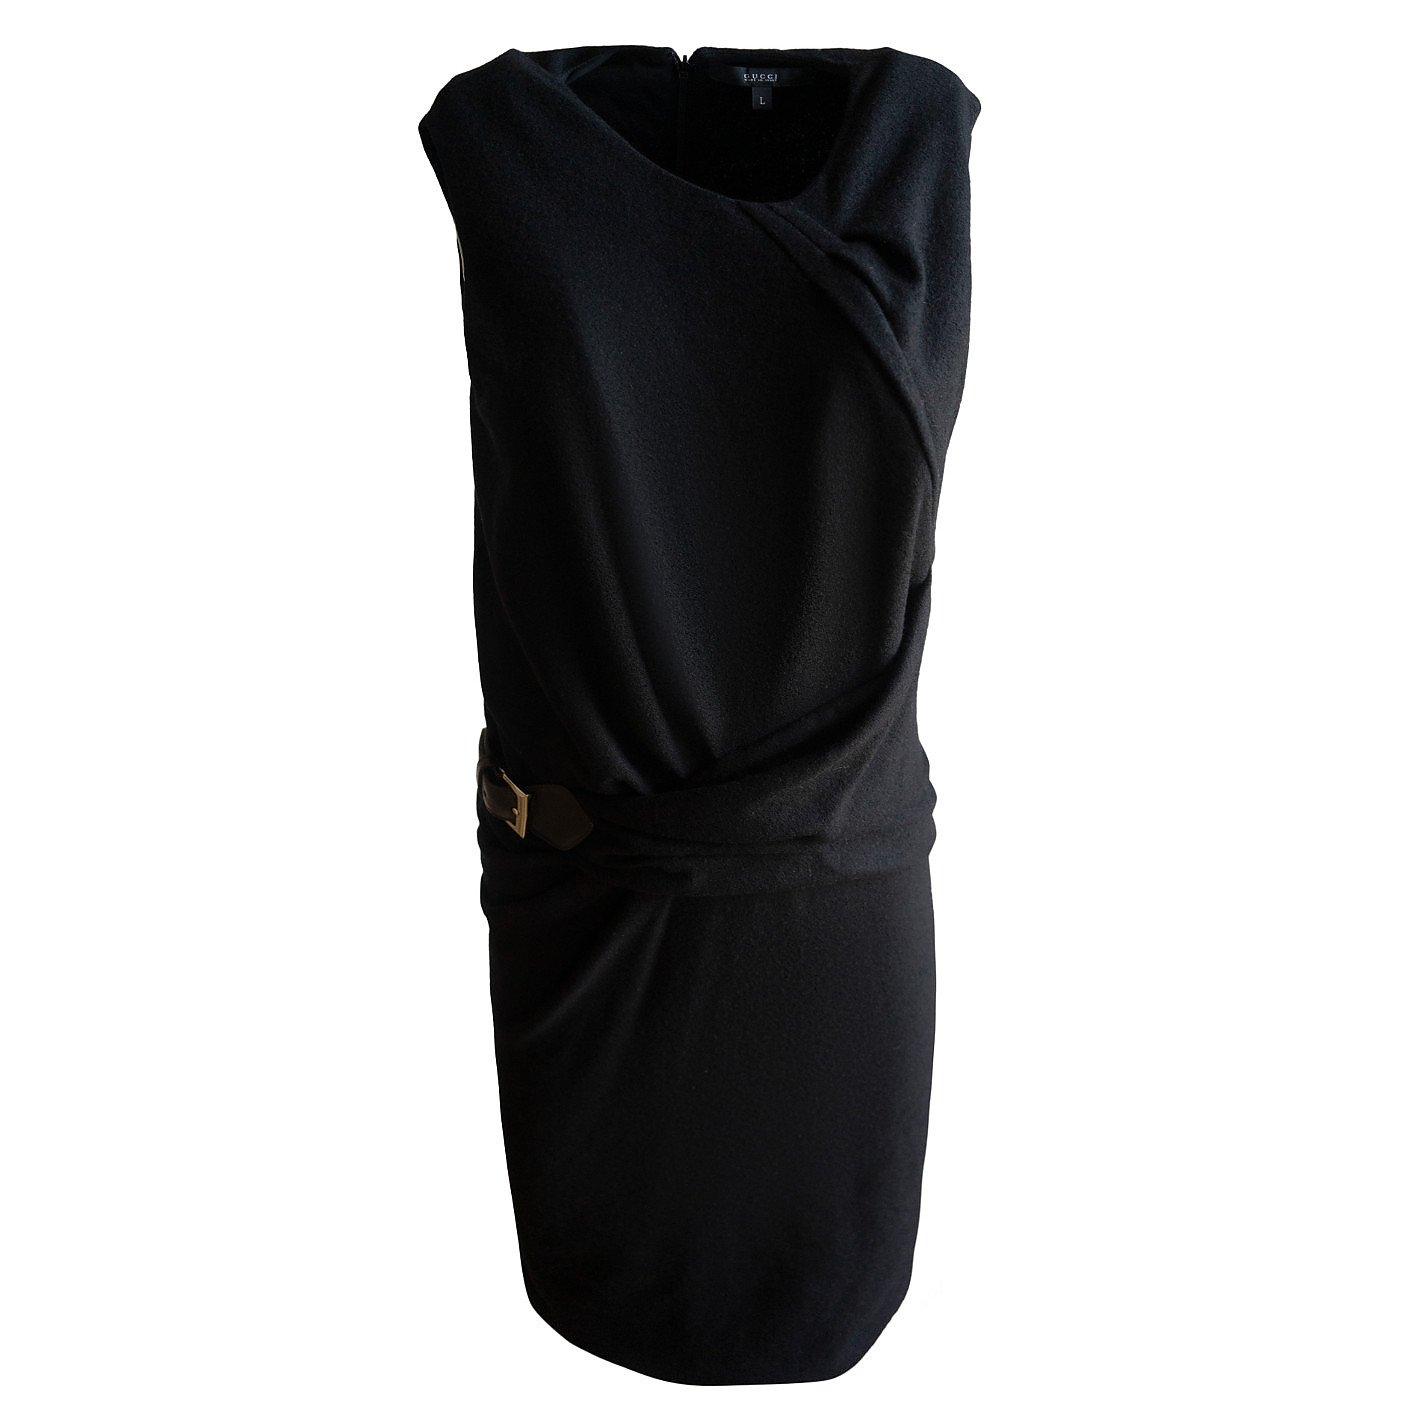 Gucci Buckle-Detail Dress